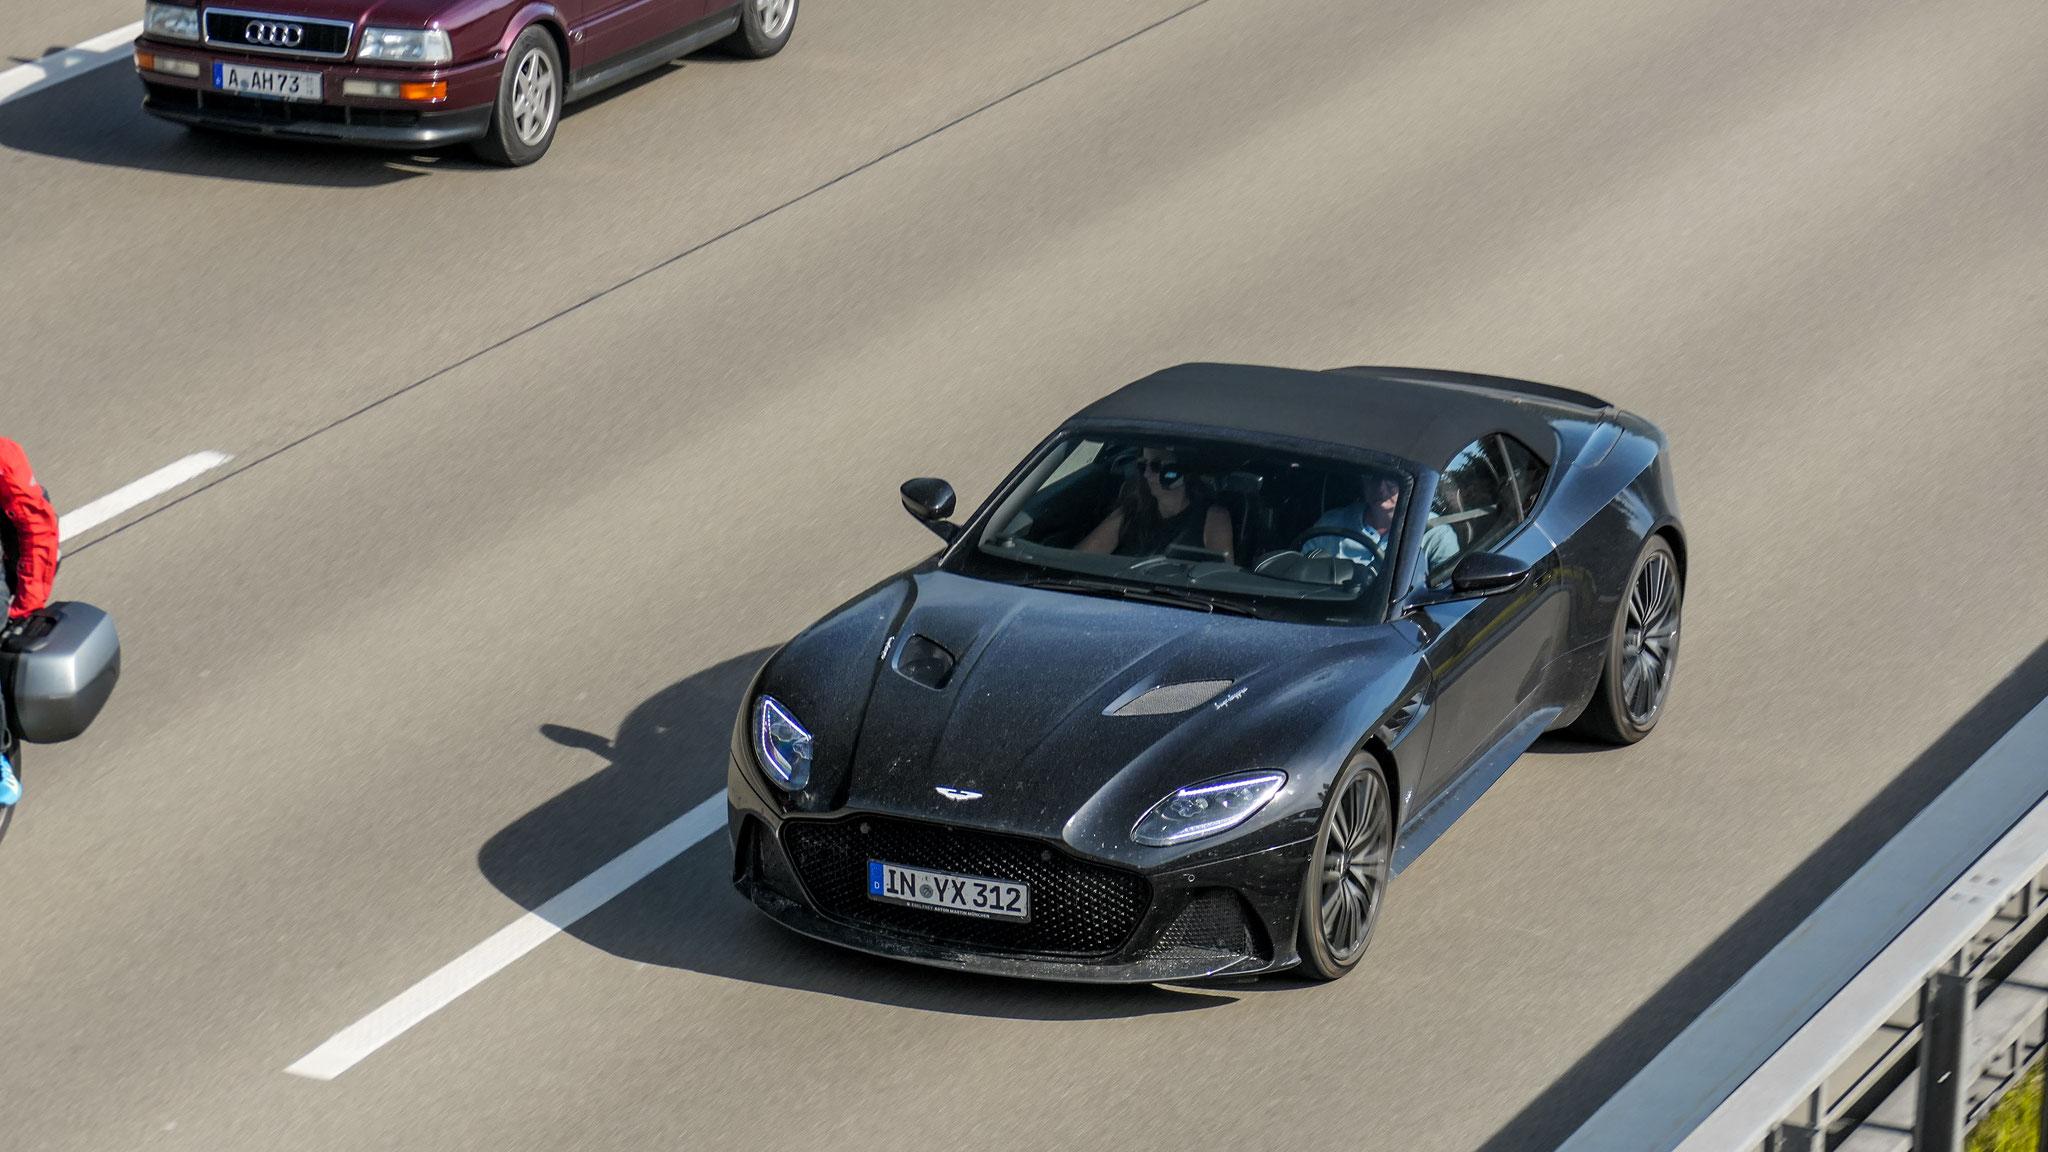 Aston Martin DBS Superleggera Volante - IN-YX-312